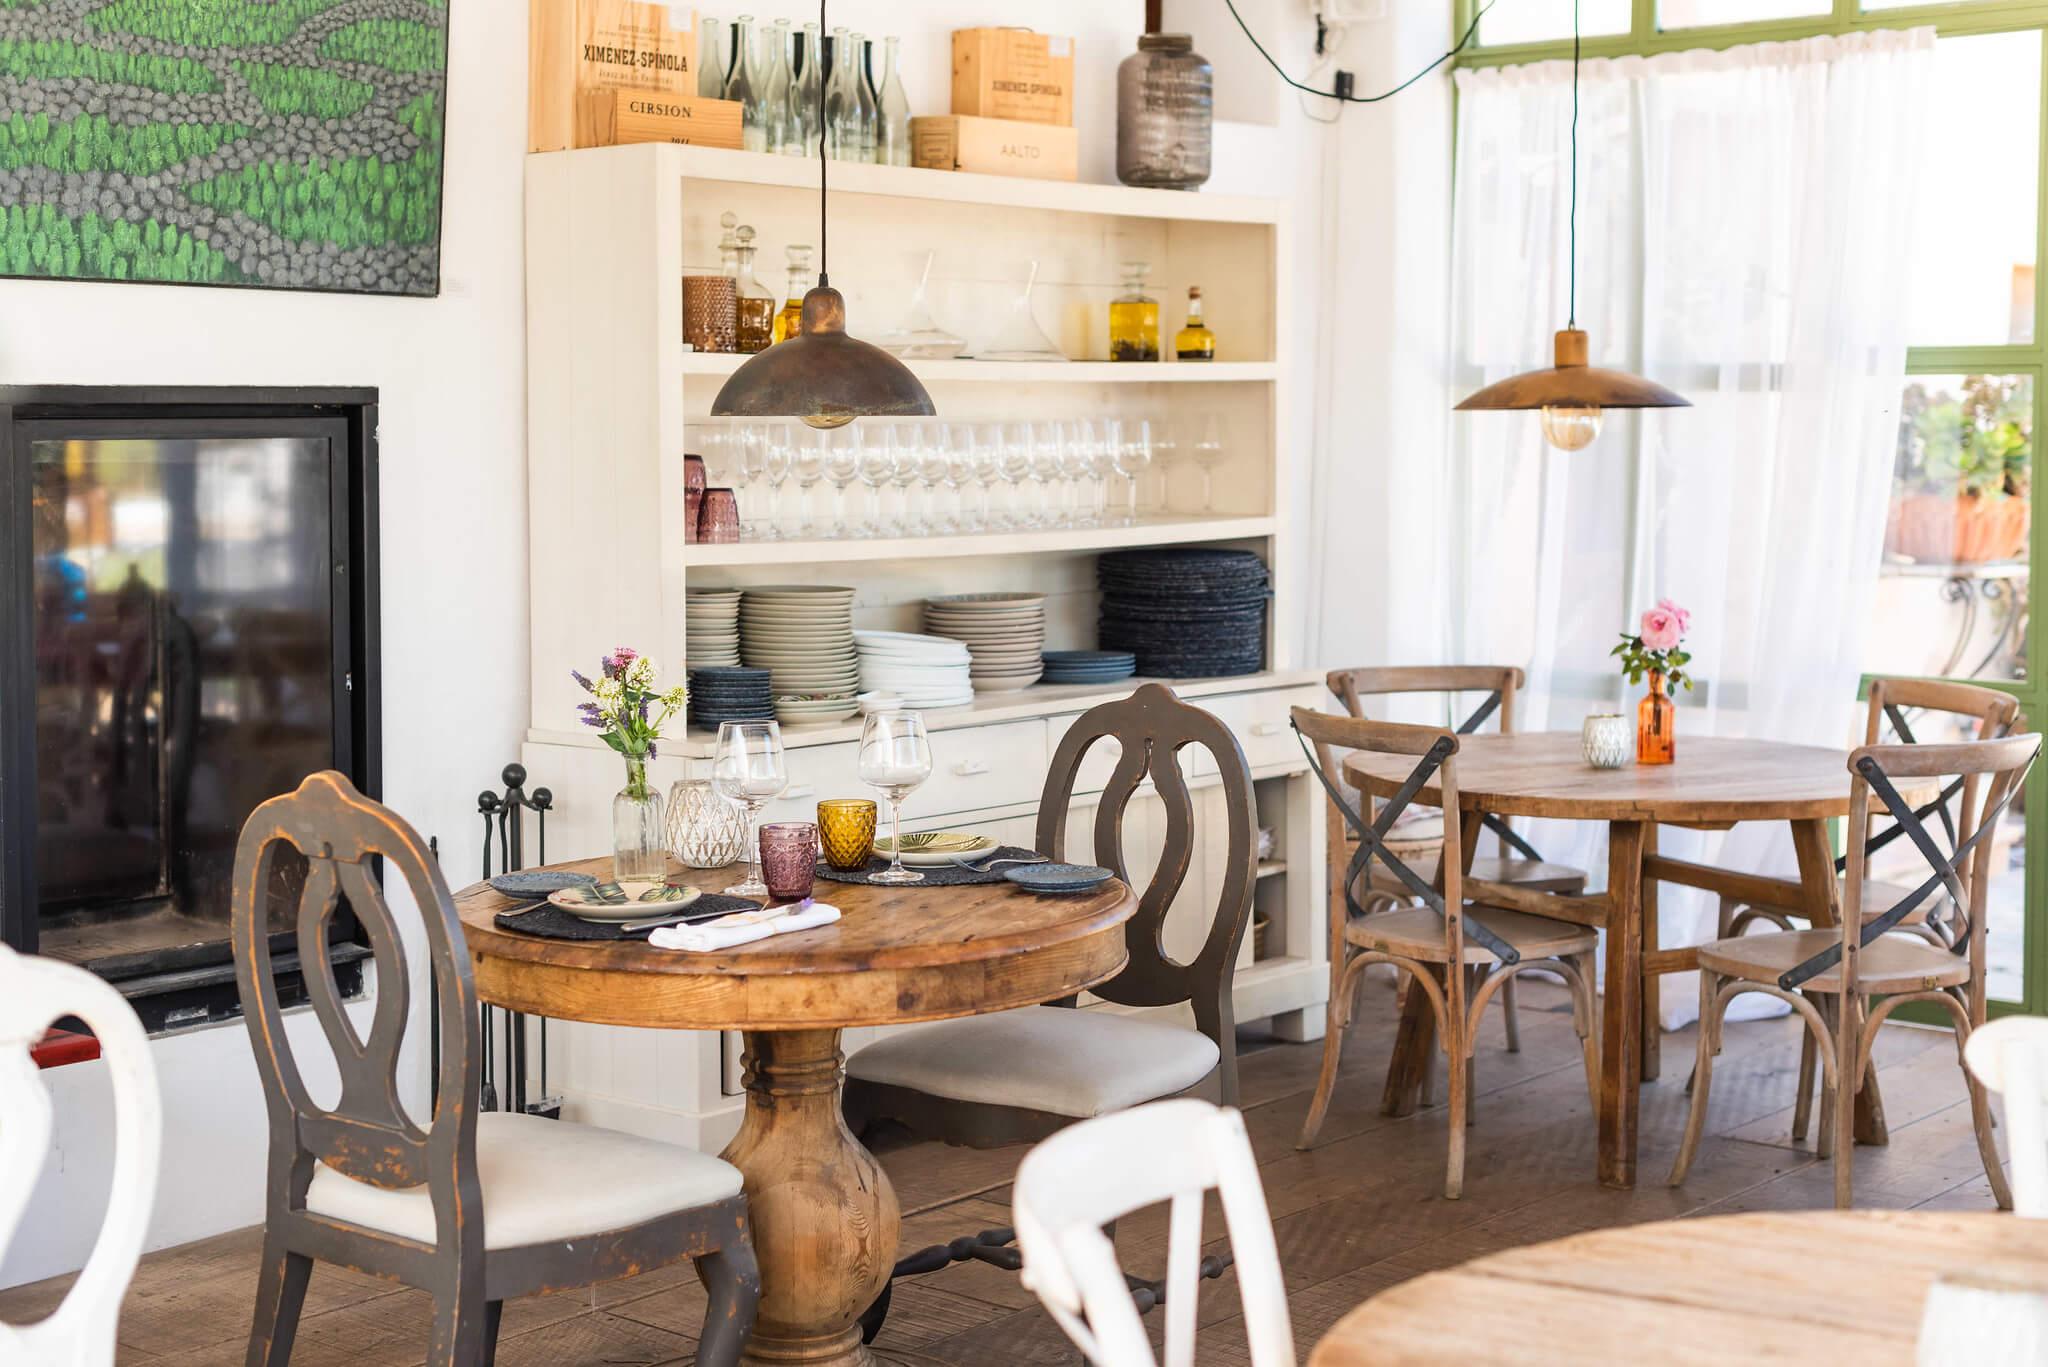 https://www.white-ibiza.com/wp-content/uploads/2020/03/white-ibiza-restaurants-es-cucons-09.jpg